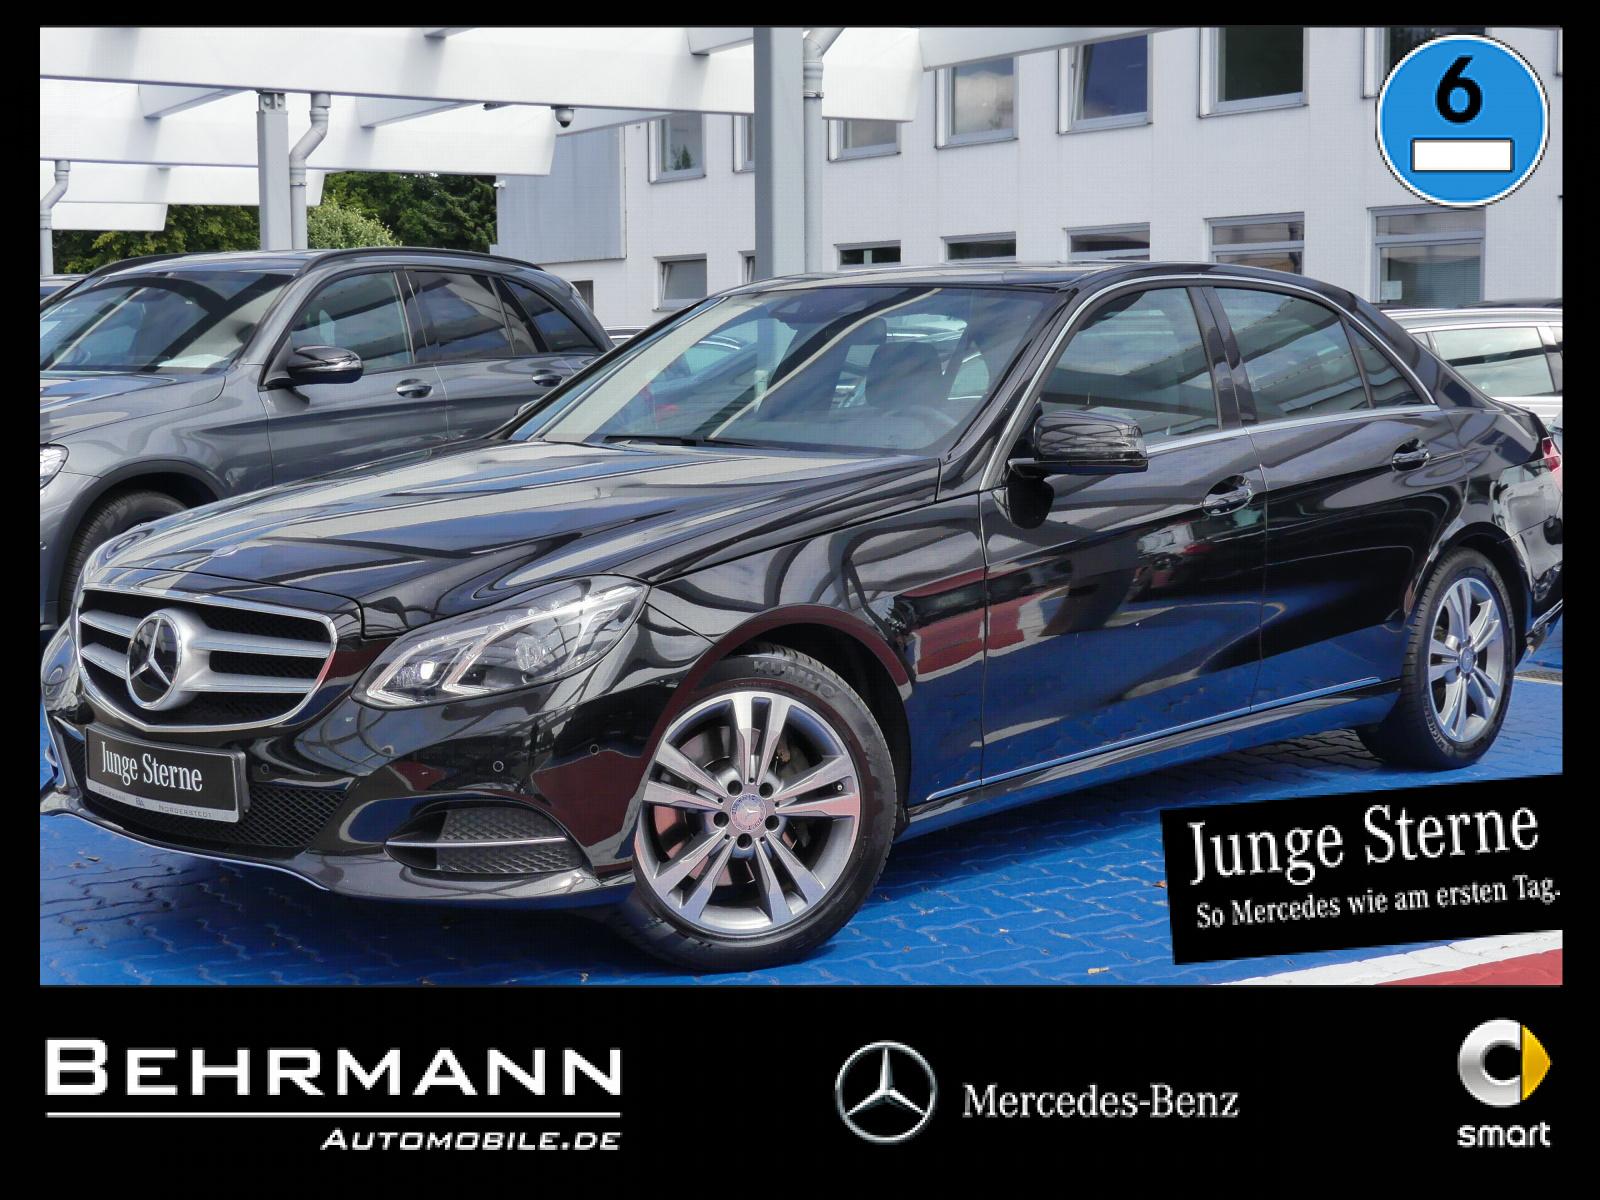 Mercedes-Benz E 250 Avantgarde Distronic+Schiebedach+Comand+SHZ, Jahr 2015, Diesel